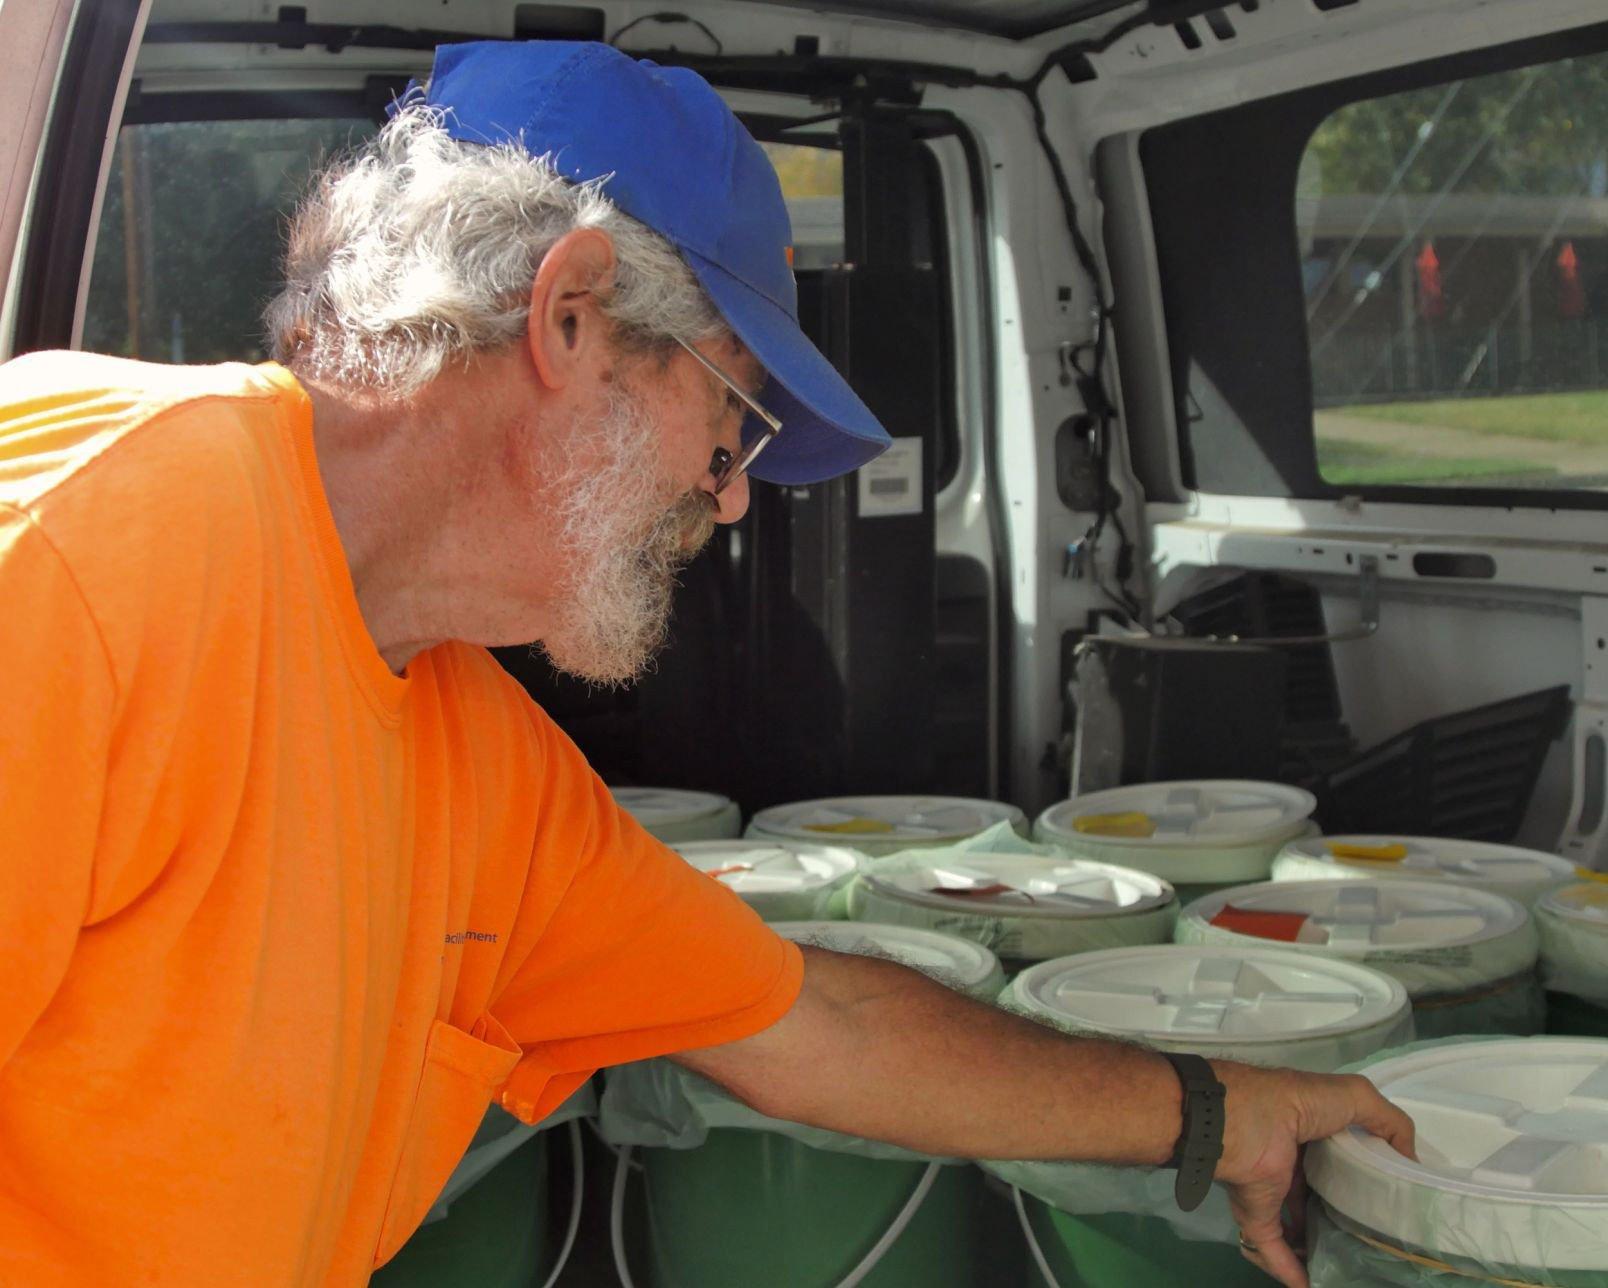 UTA compost ambassador vies for sustainability